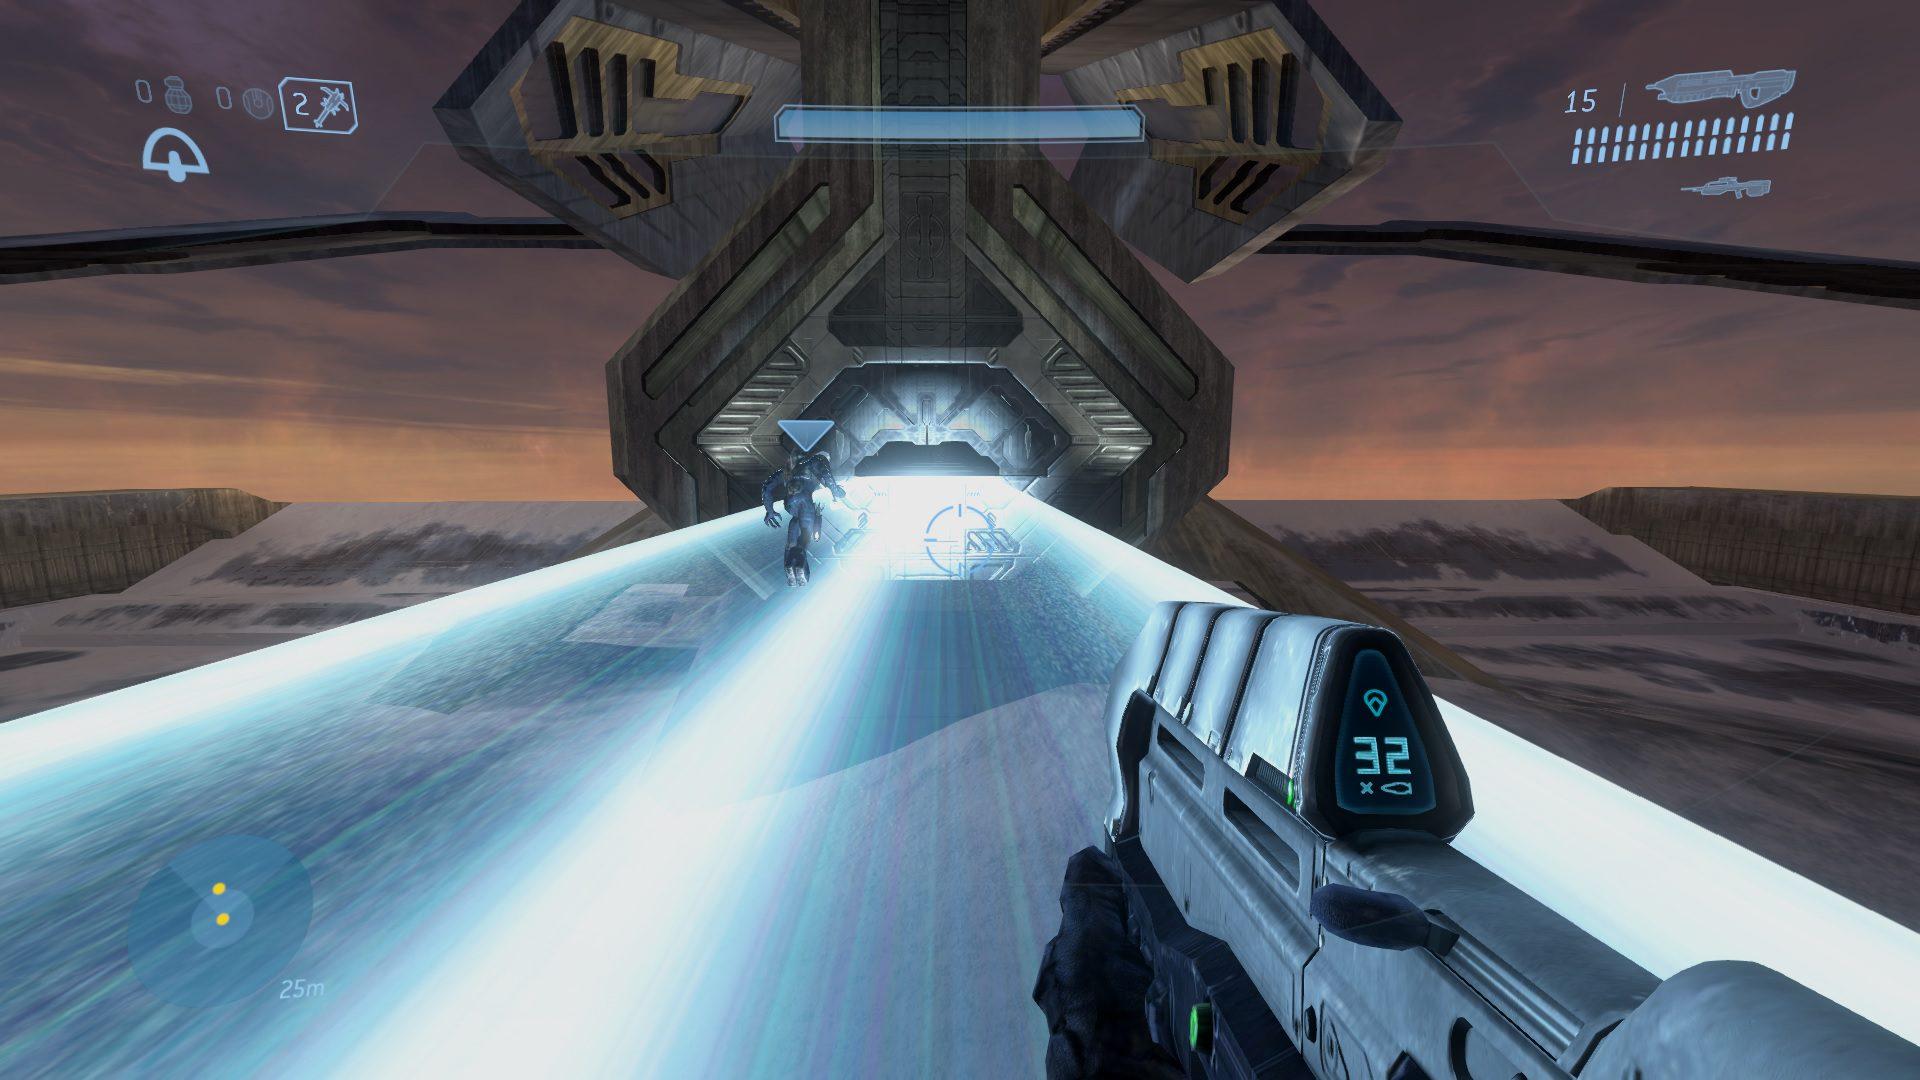 Análisis de Halo 3 para PC